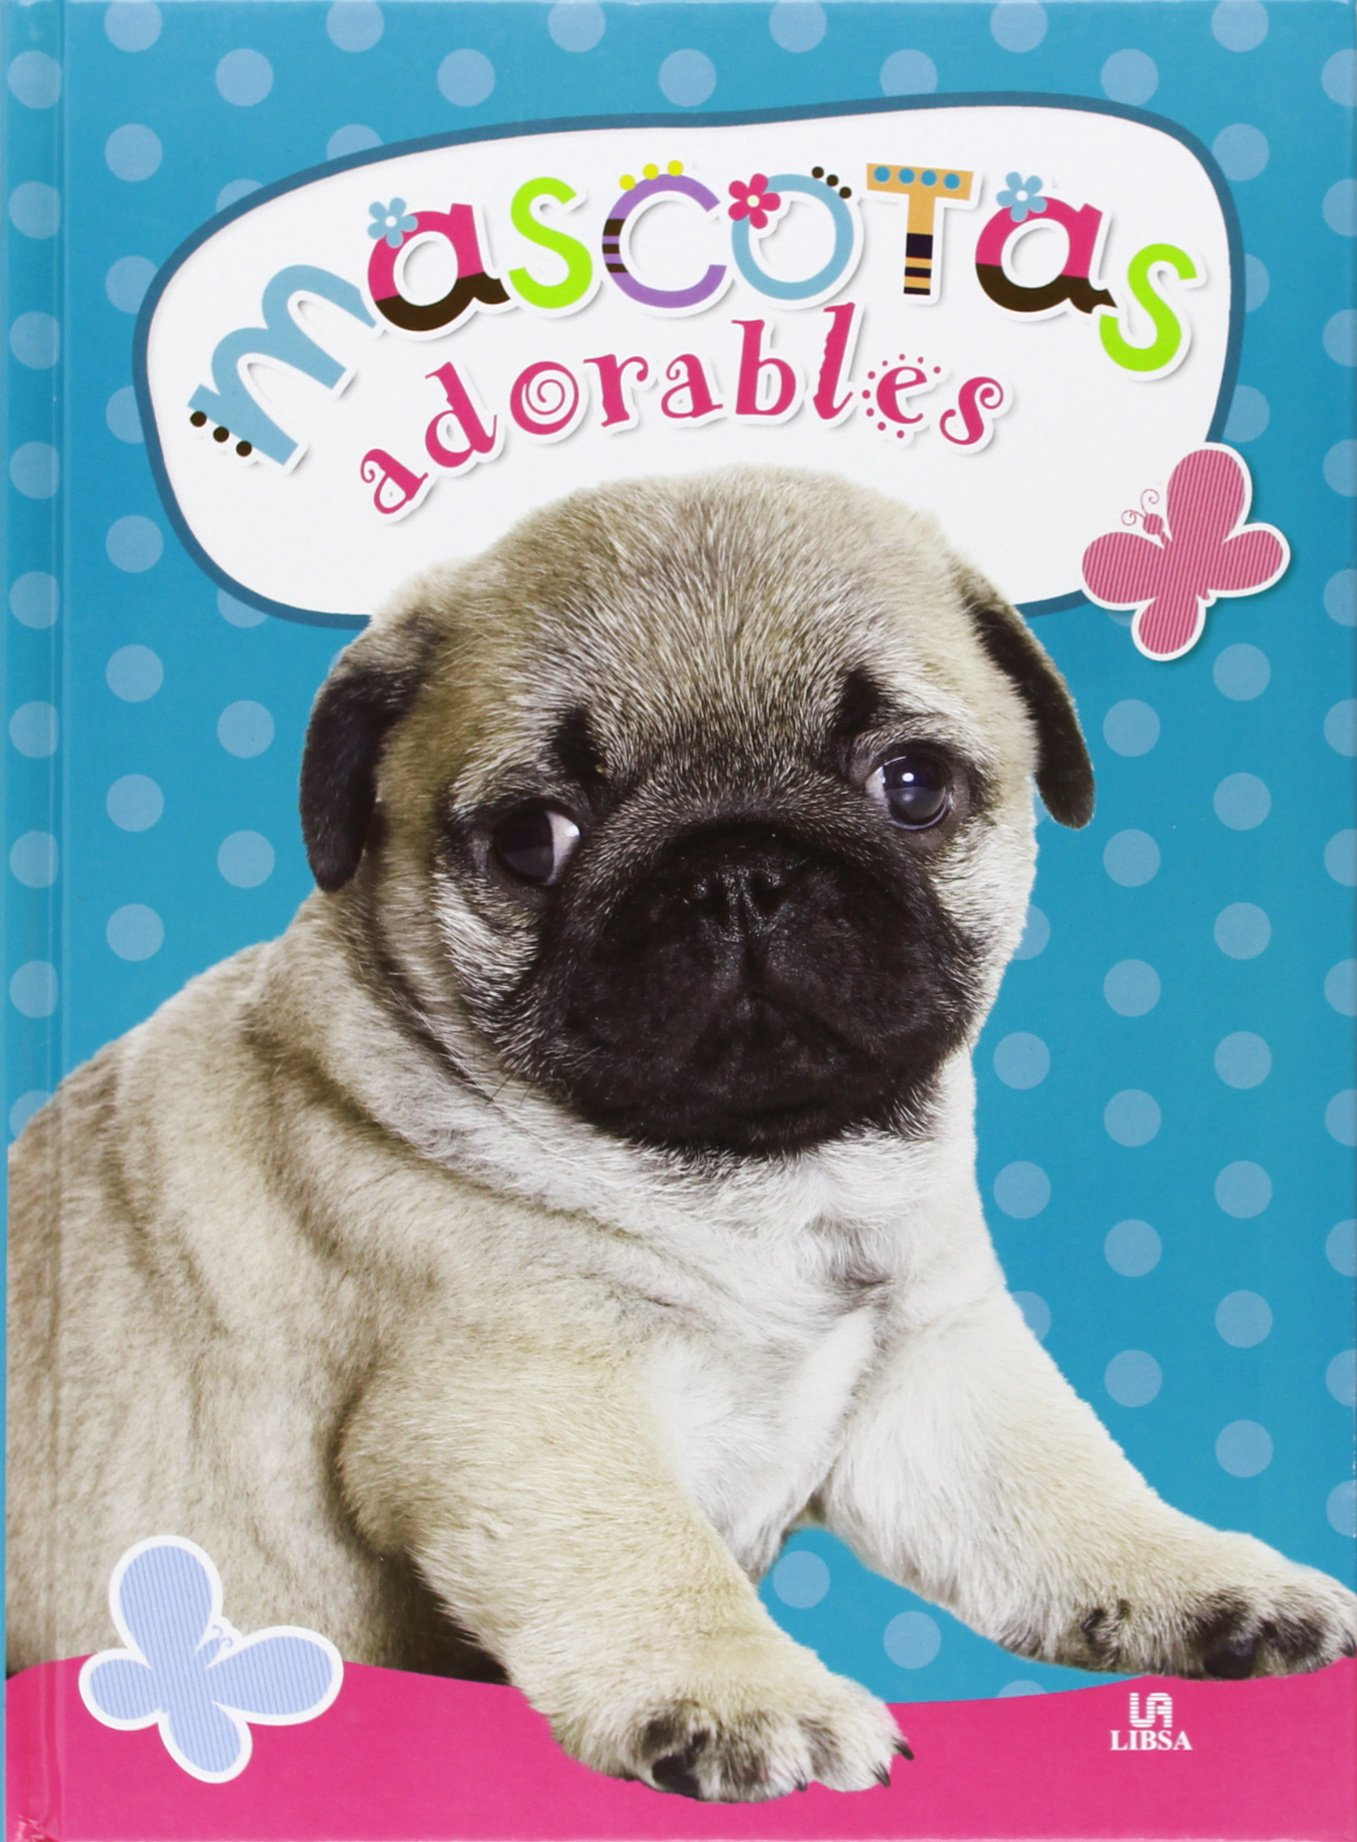 Mascotas Adorables (Spanish) Hardcover – 2014